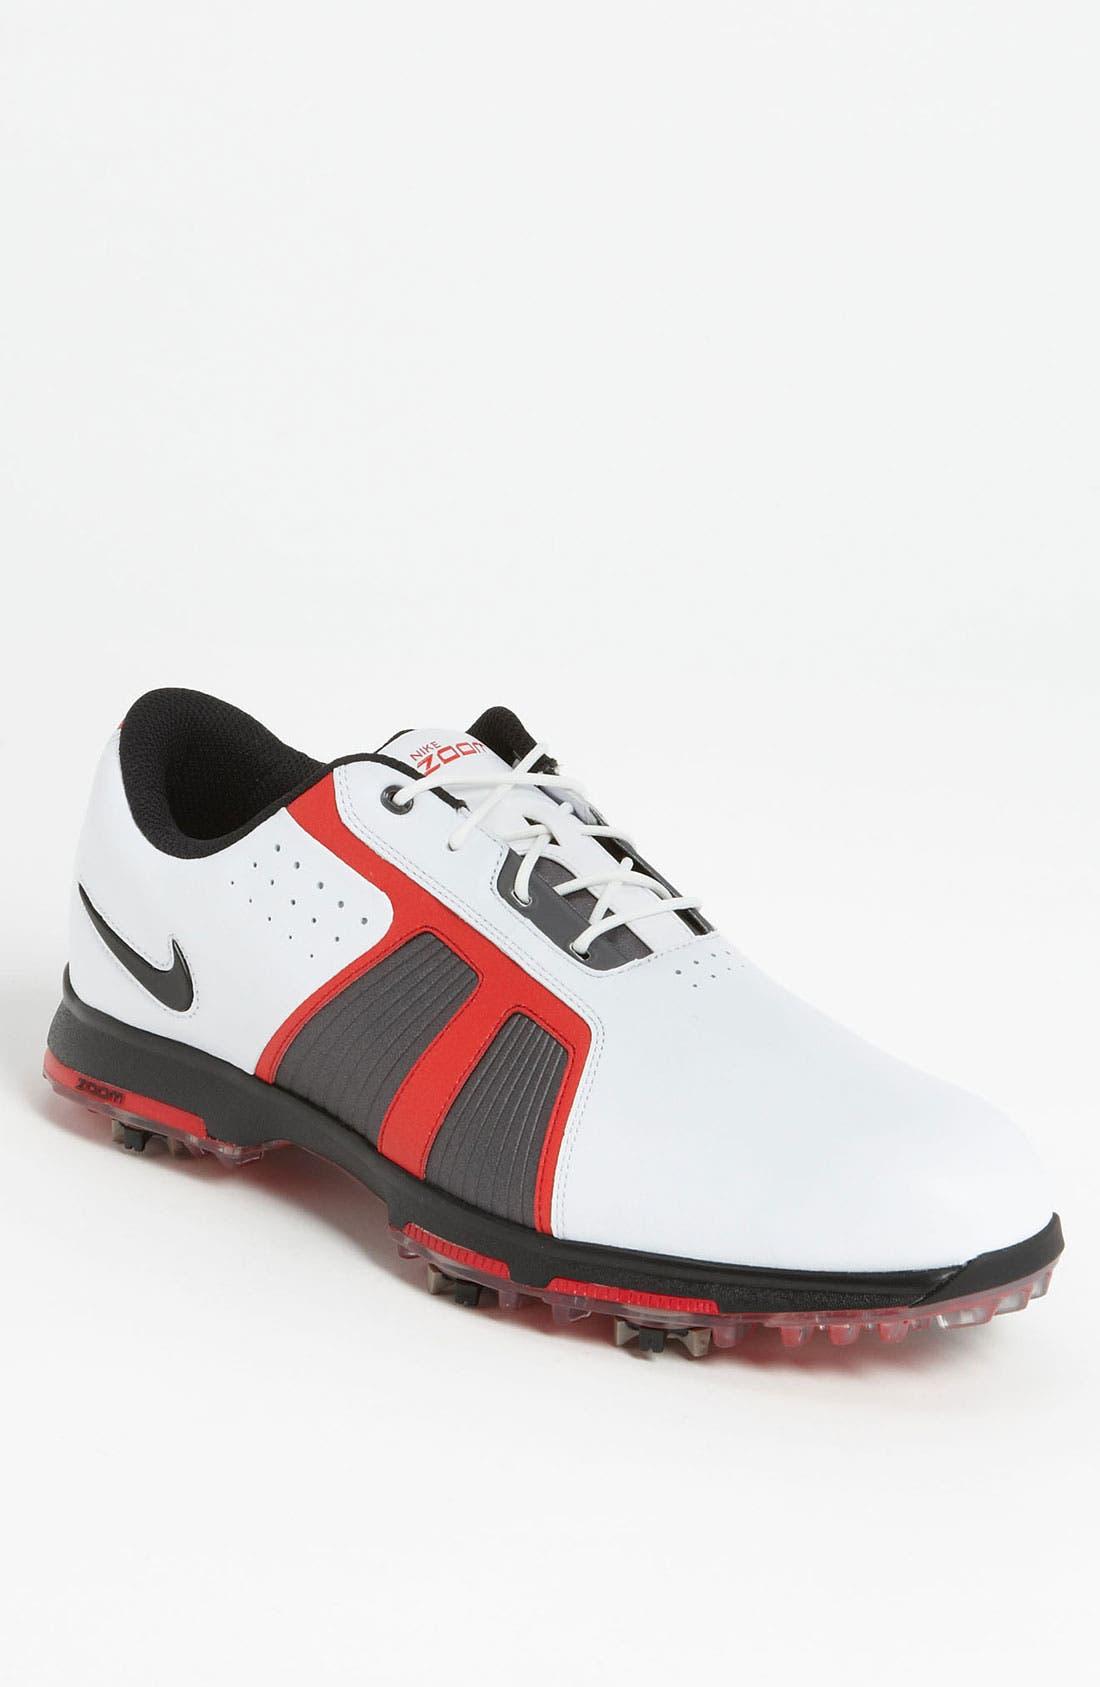 Main Image - Nike 'Zoom Trophy' Golf Shoe (Men)